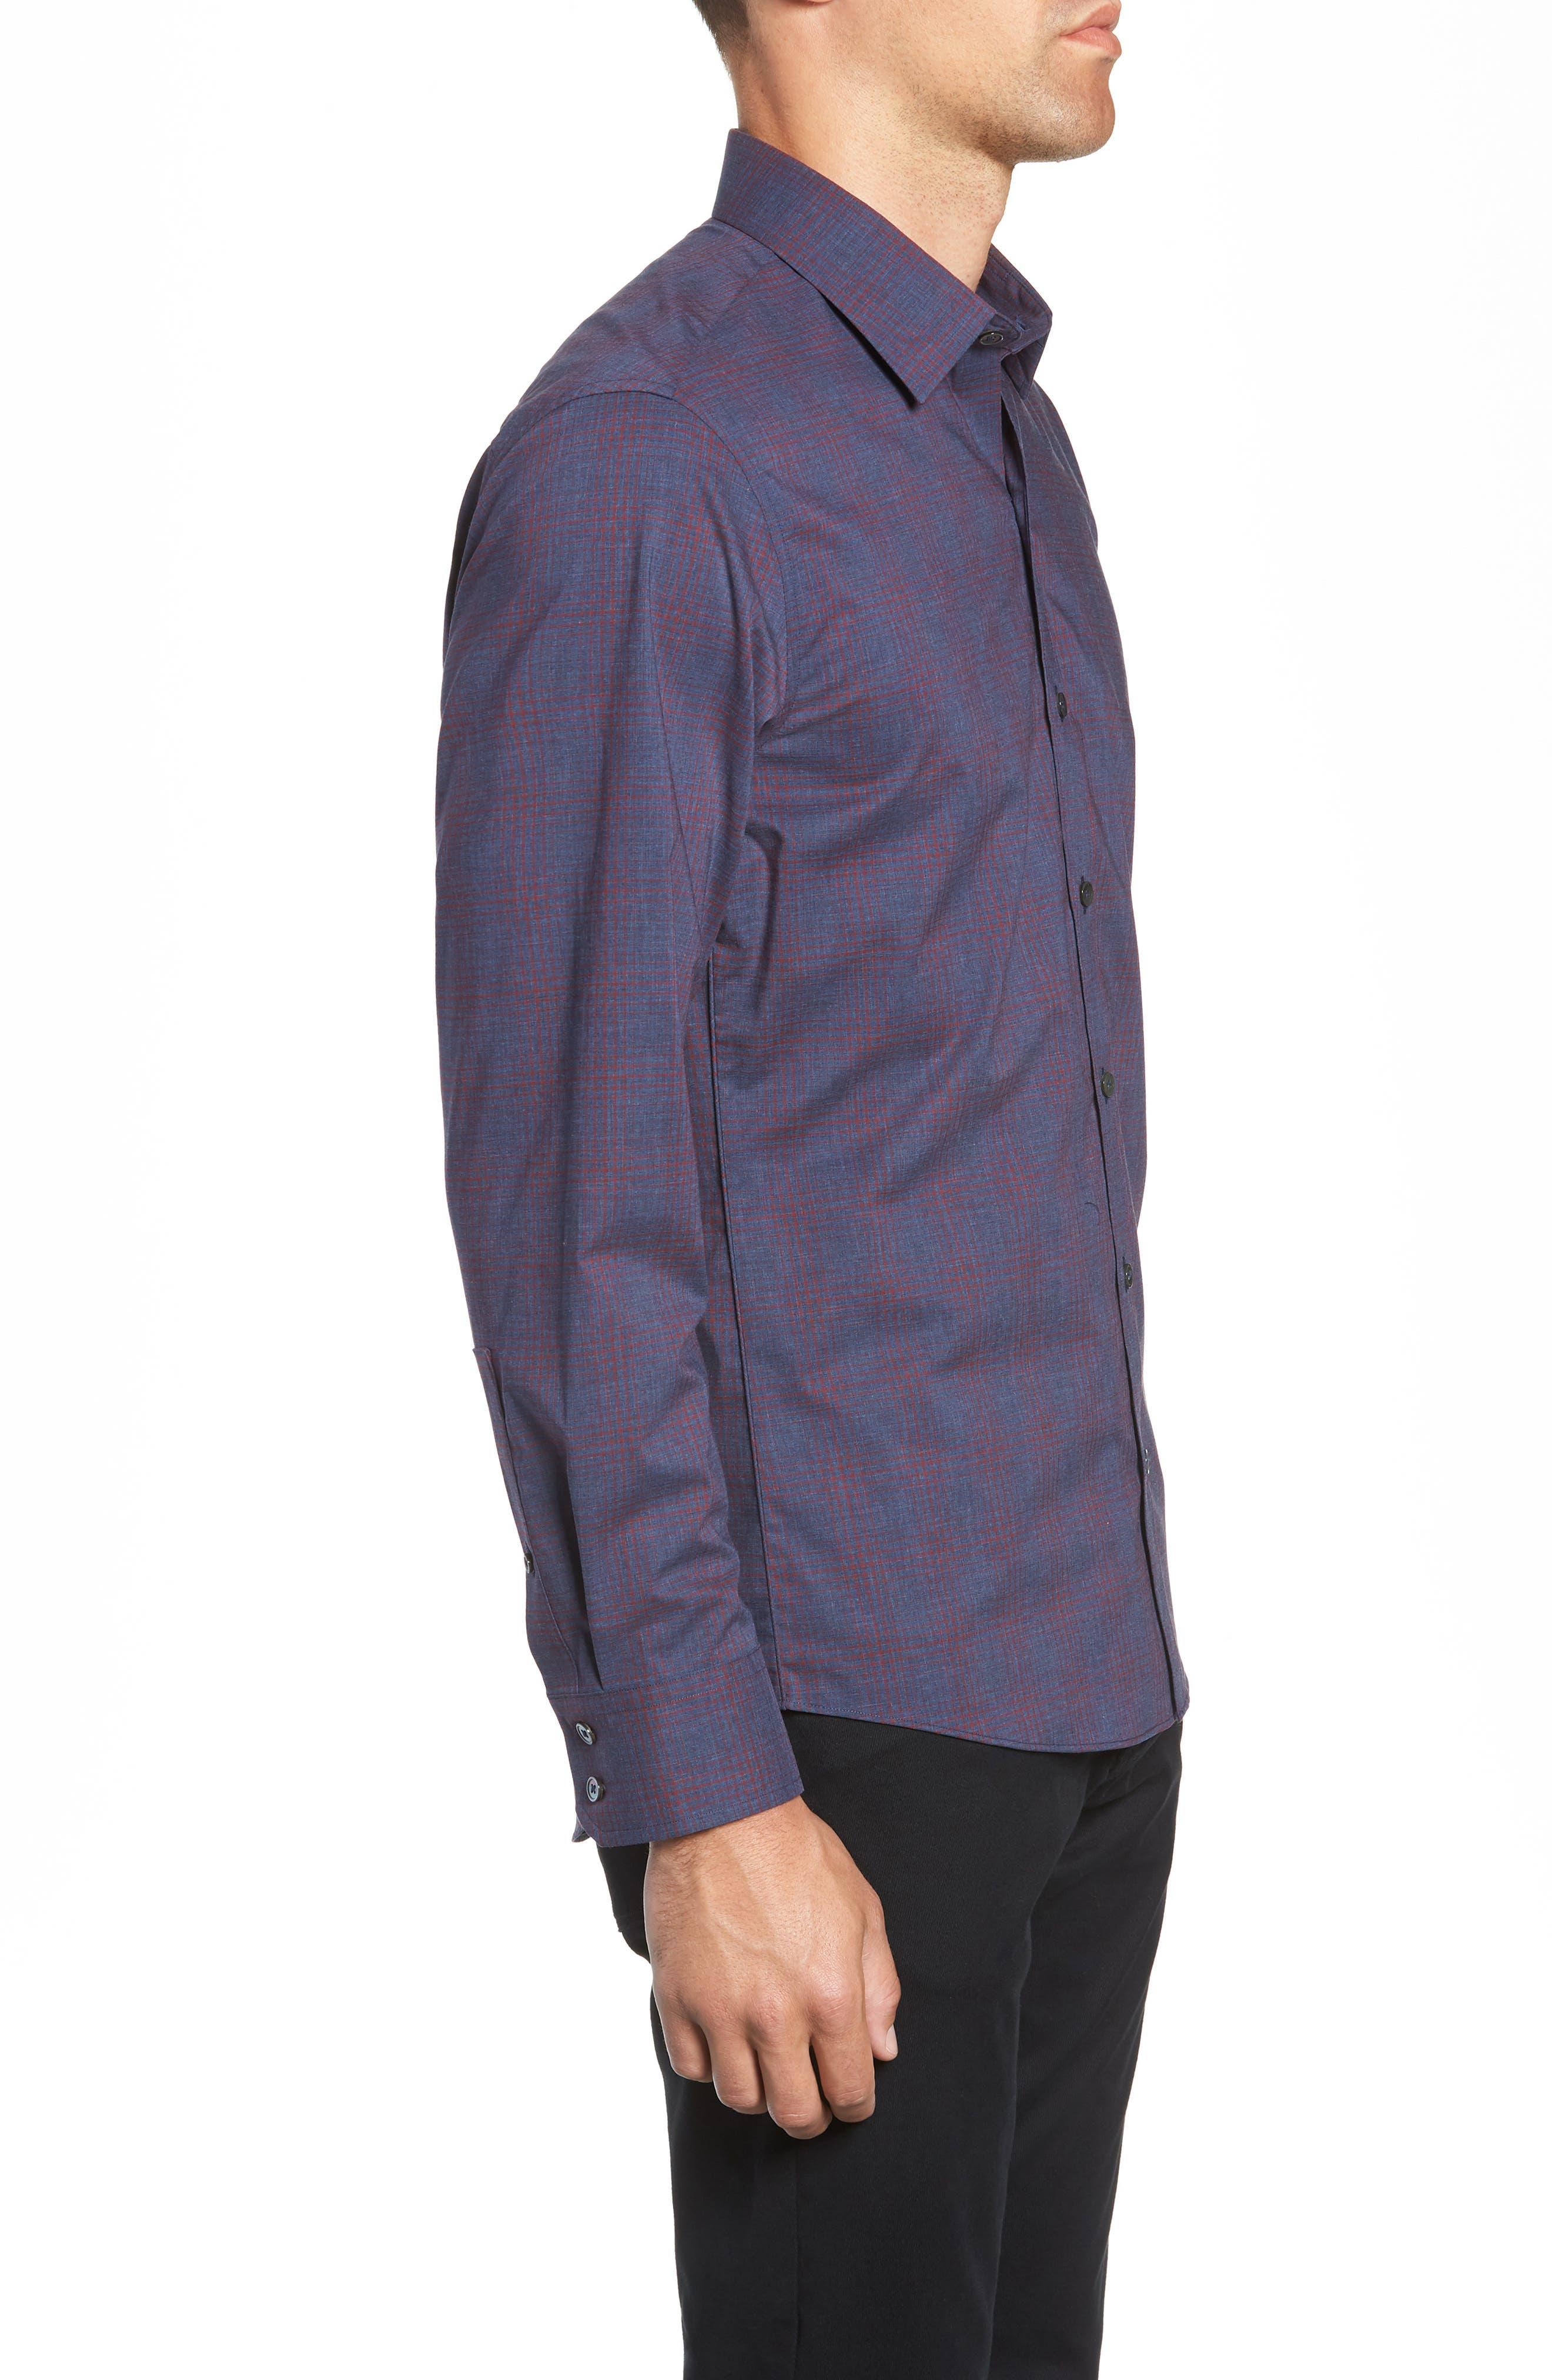 ZACHARY PRELL,                             Maslin Regular Fit Sport Shirt,                             Alternate thumbnail 4, color,                             461